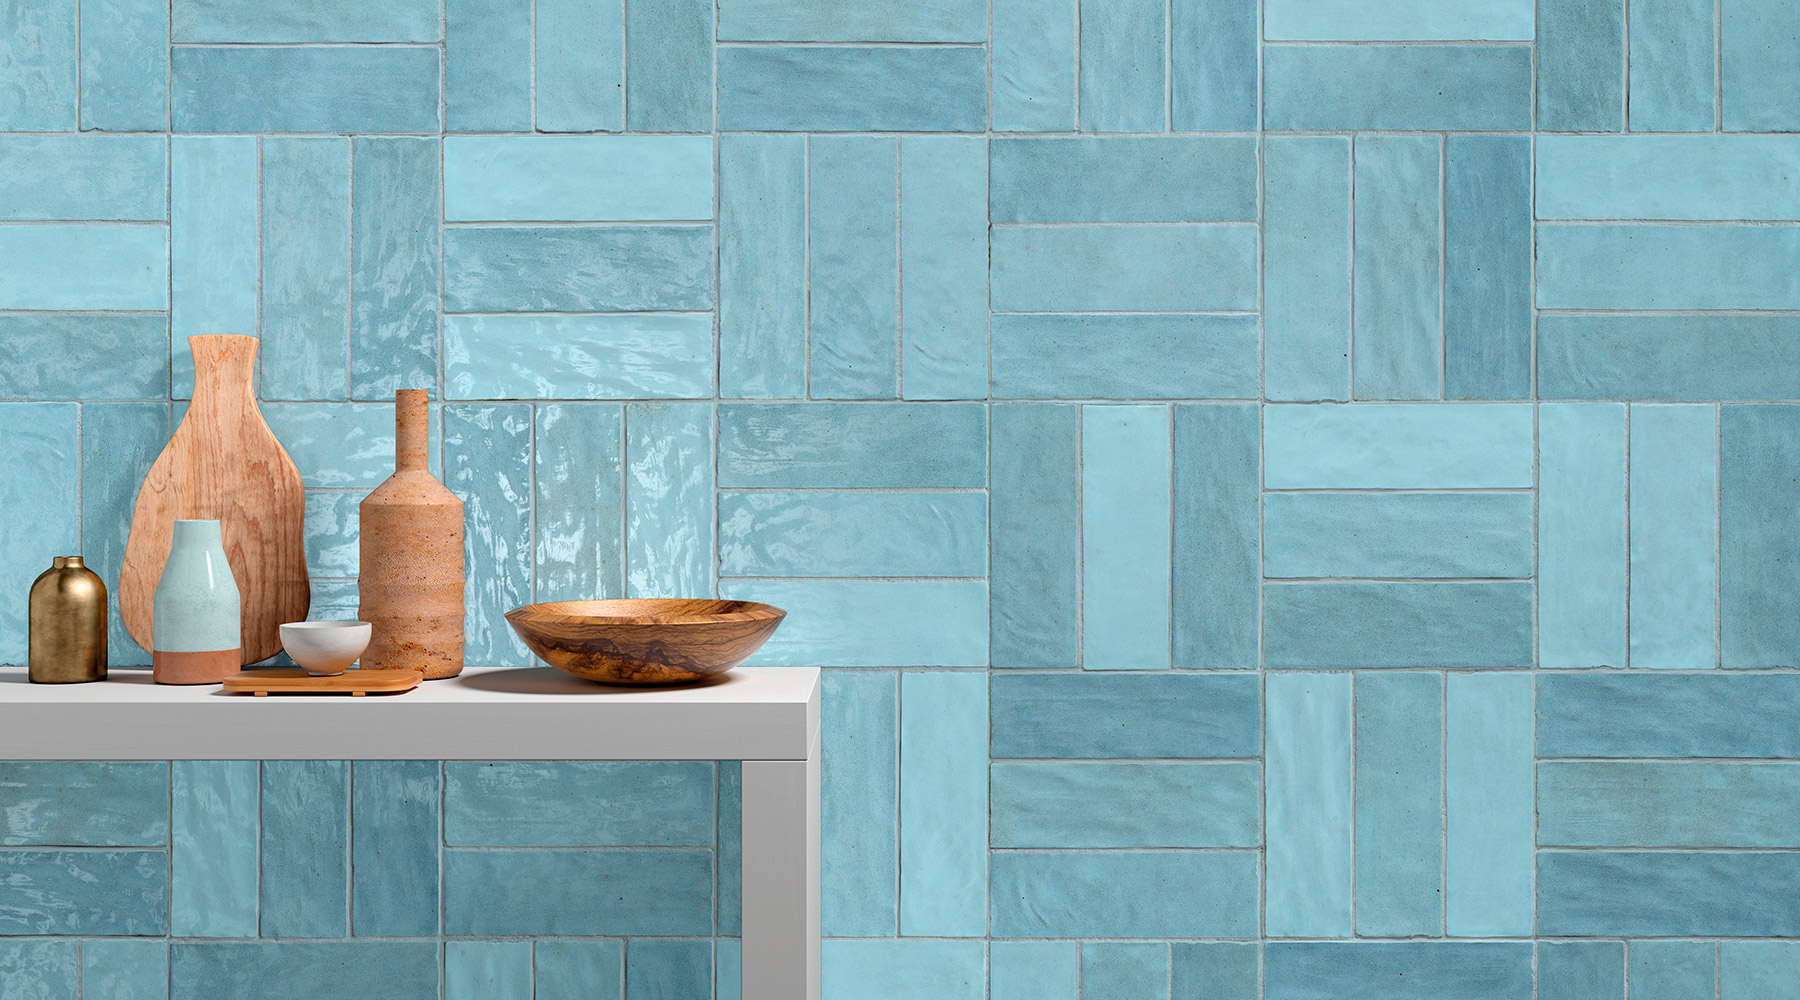 piastrelle in gres azzurre in cucina